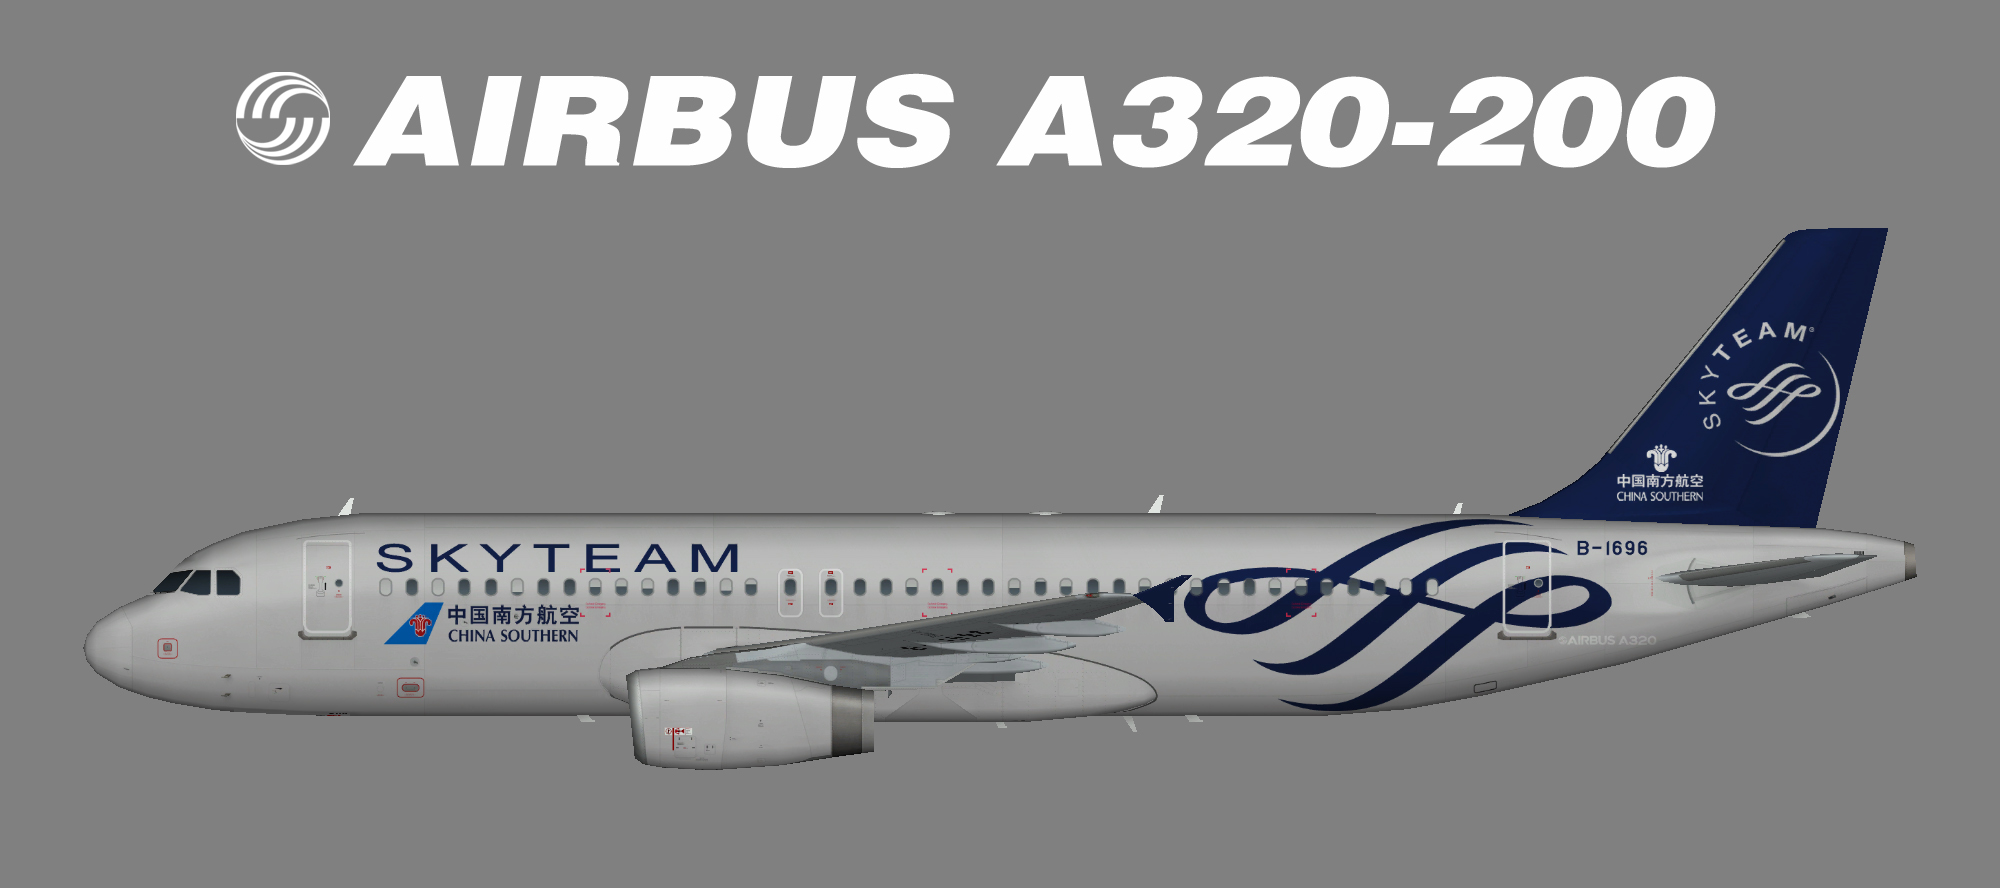 China Southern A320-200 Skyteam